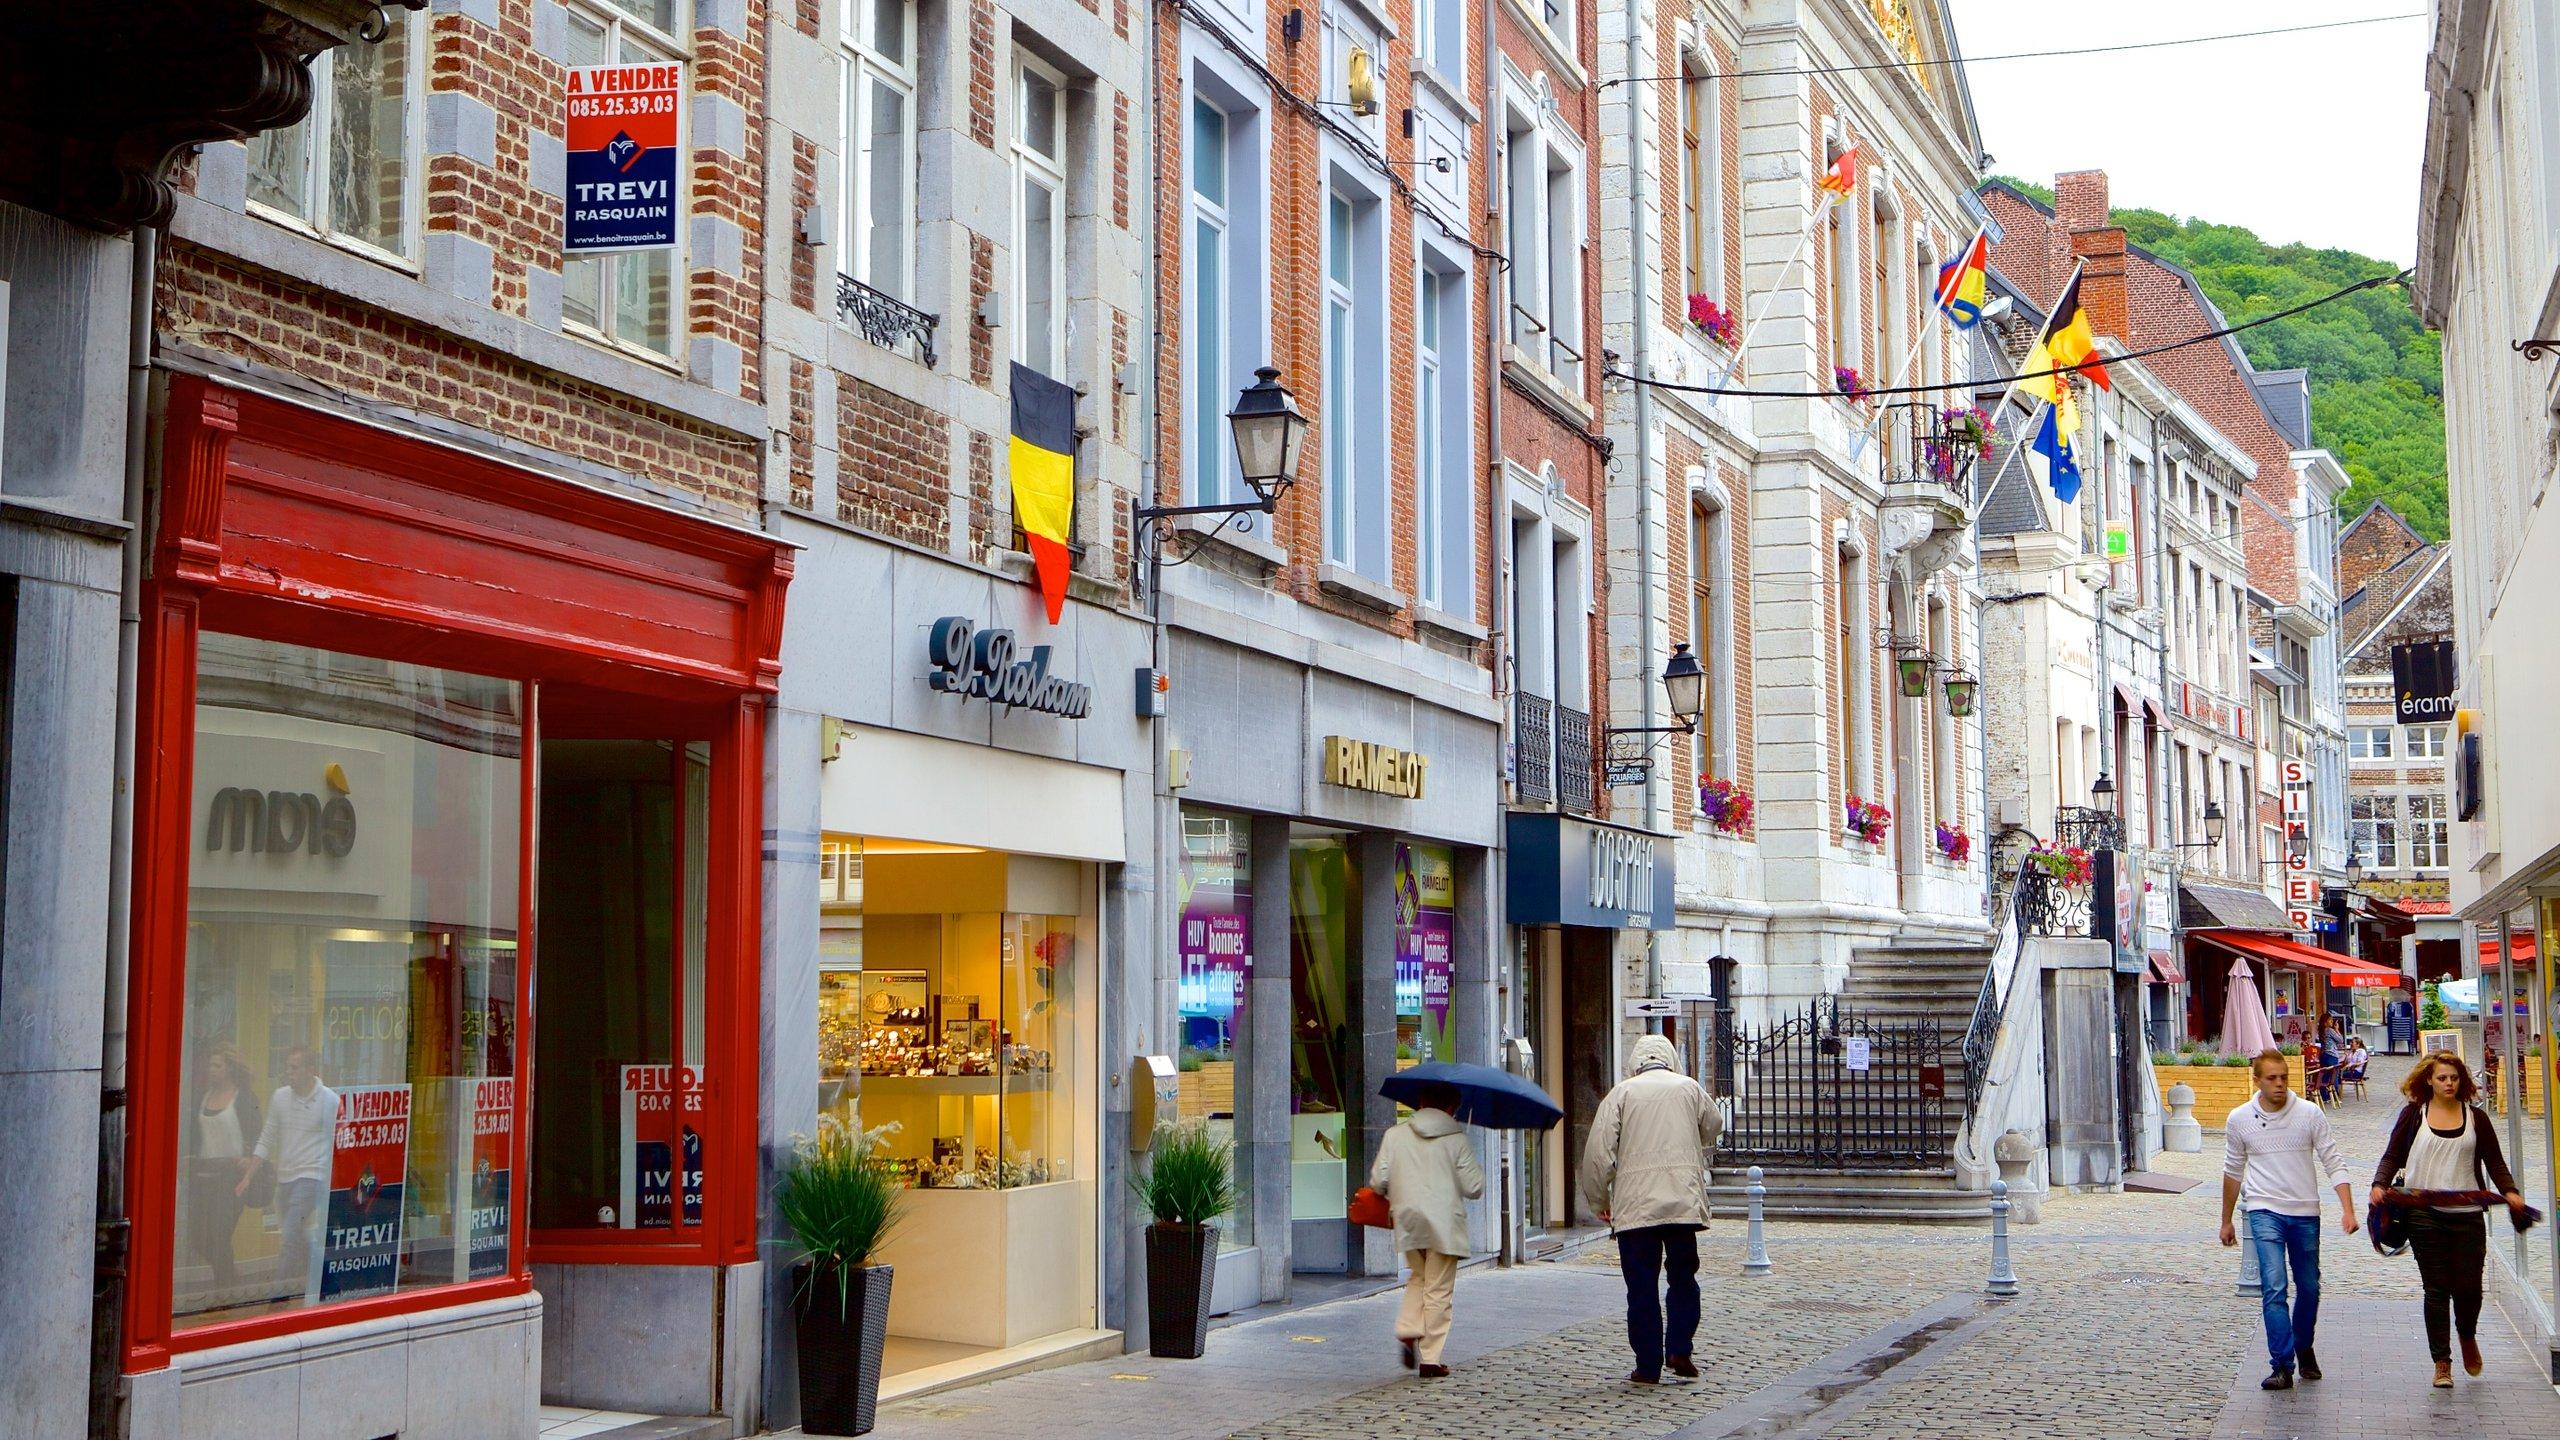 Liege Province, Walloon Region, Belgium